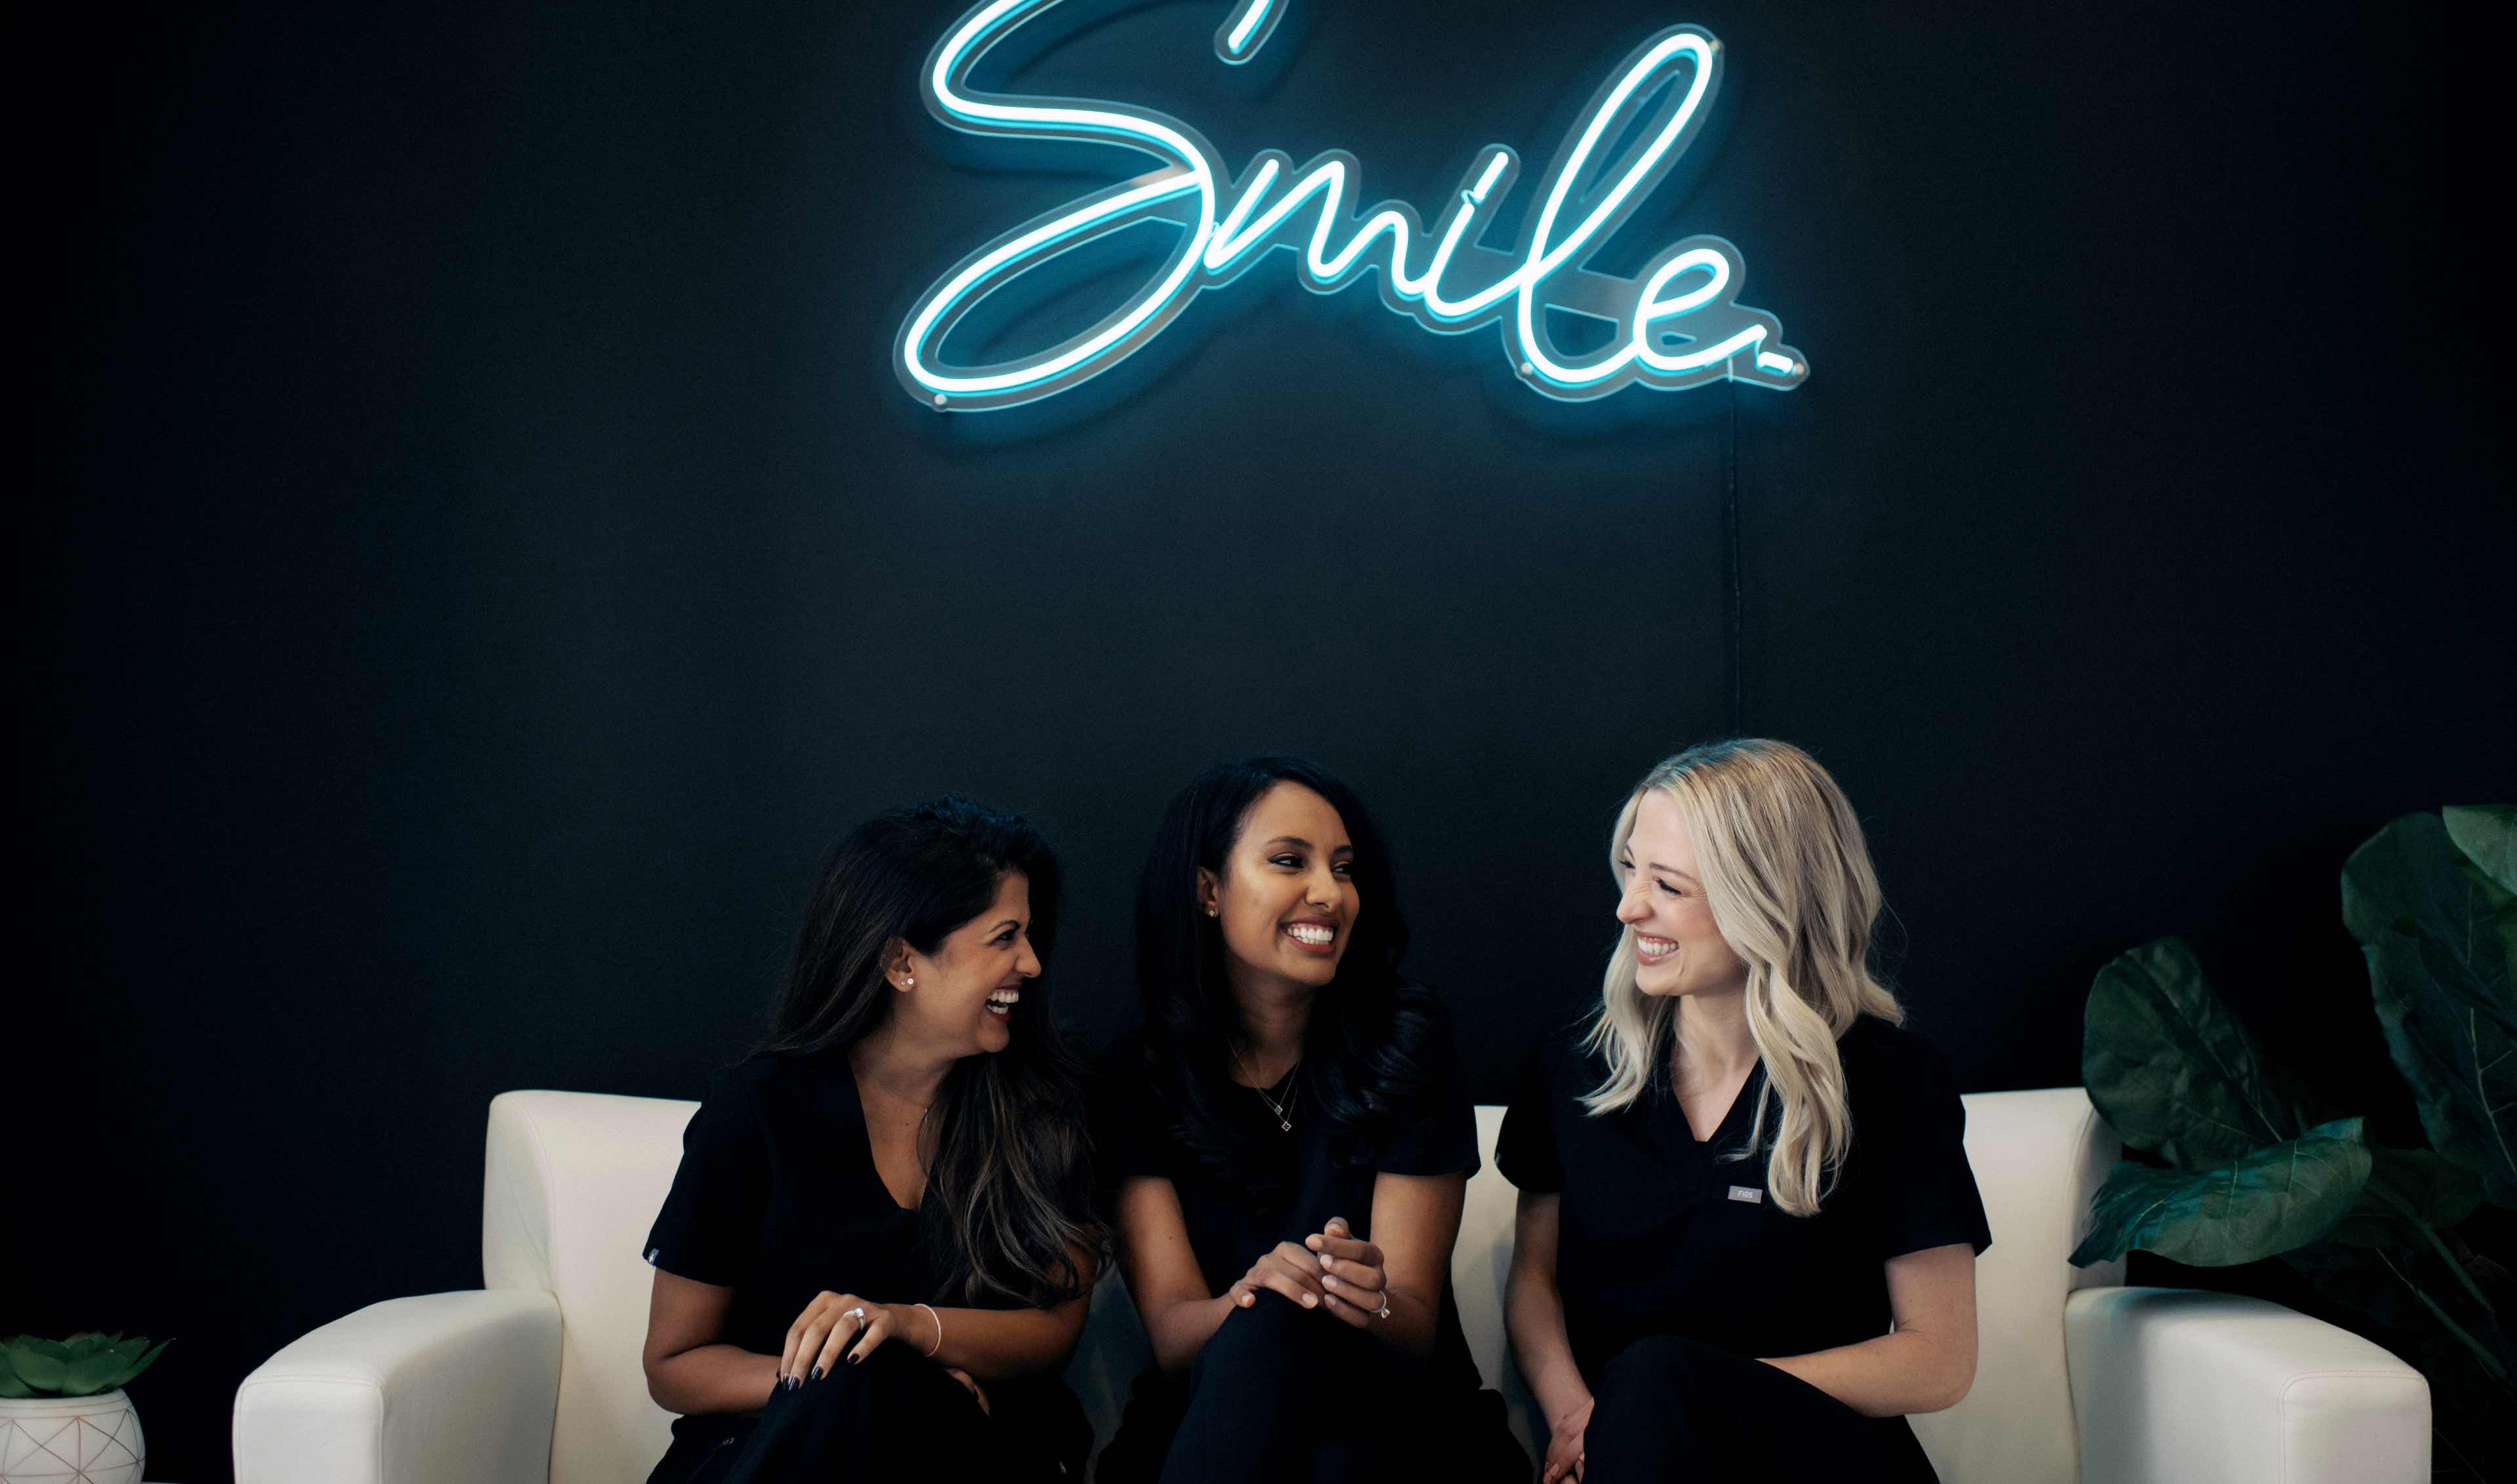 Photo of three dental team members